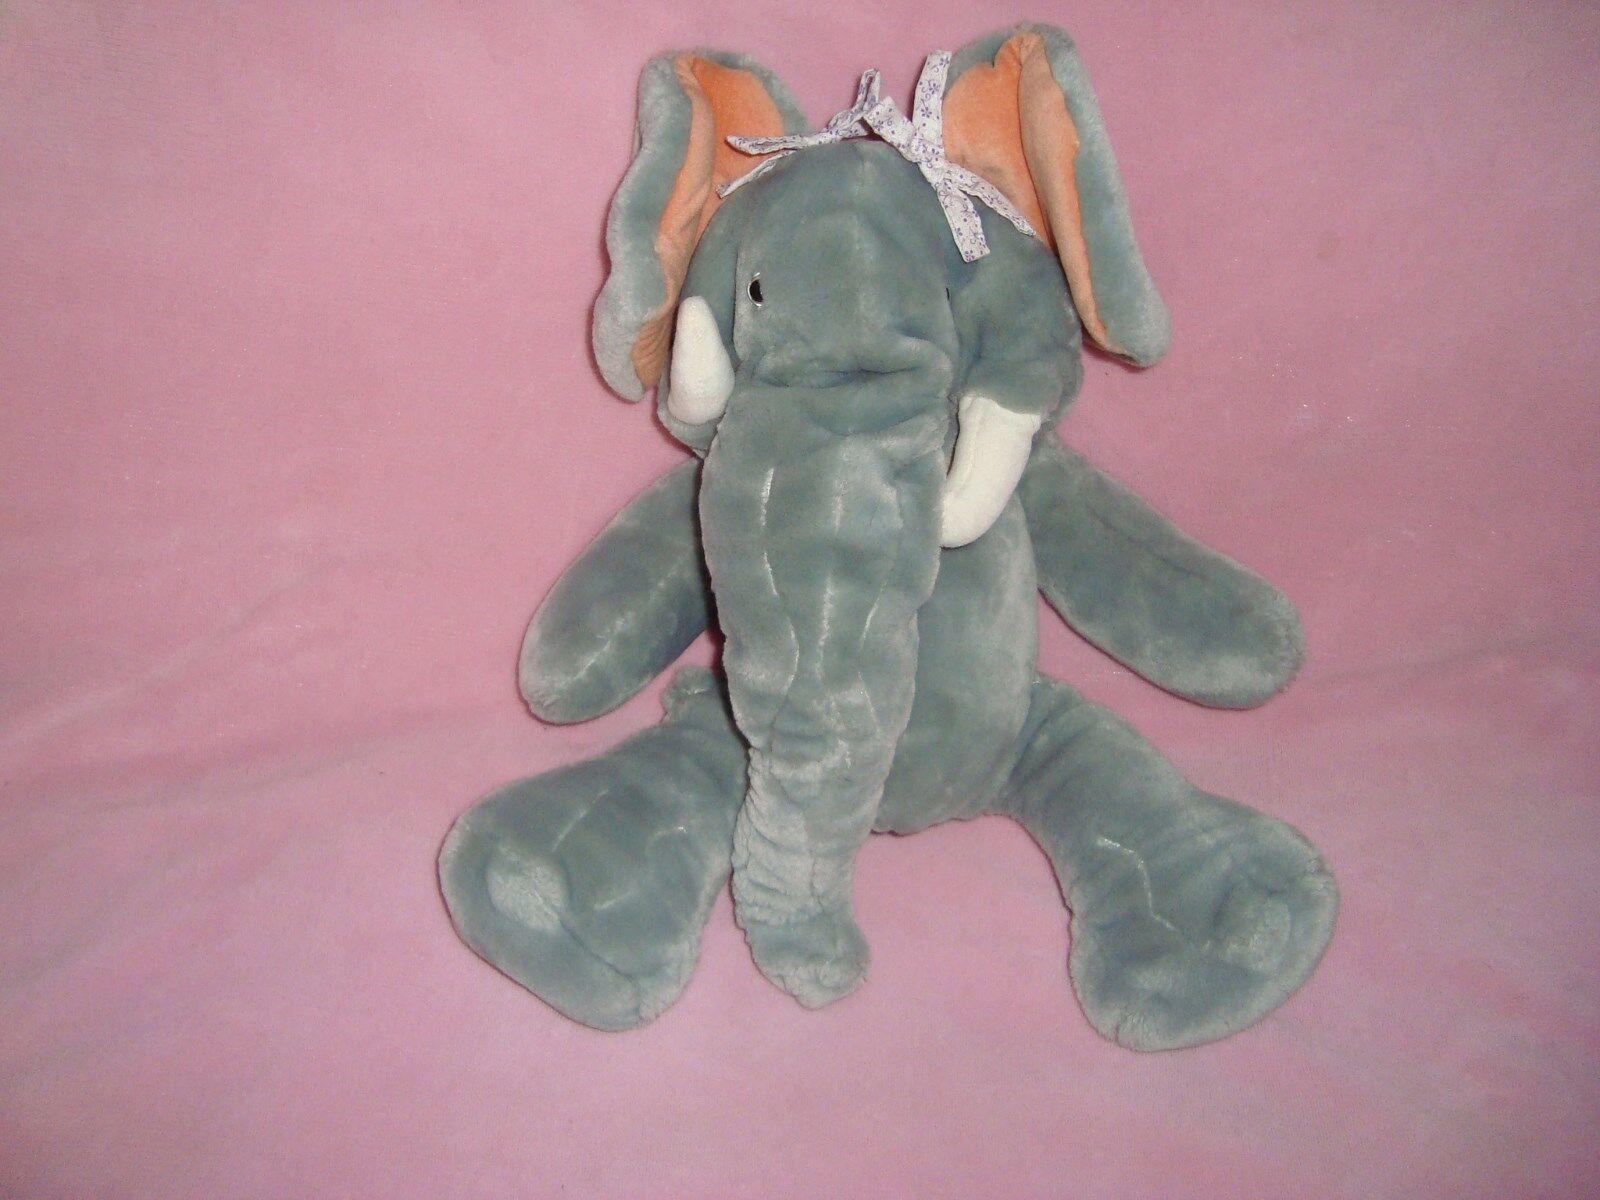 Wrinkles Elephant Trunkit Vintage Heritage Ganzbro 1985 Plush 18